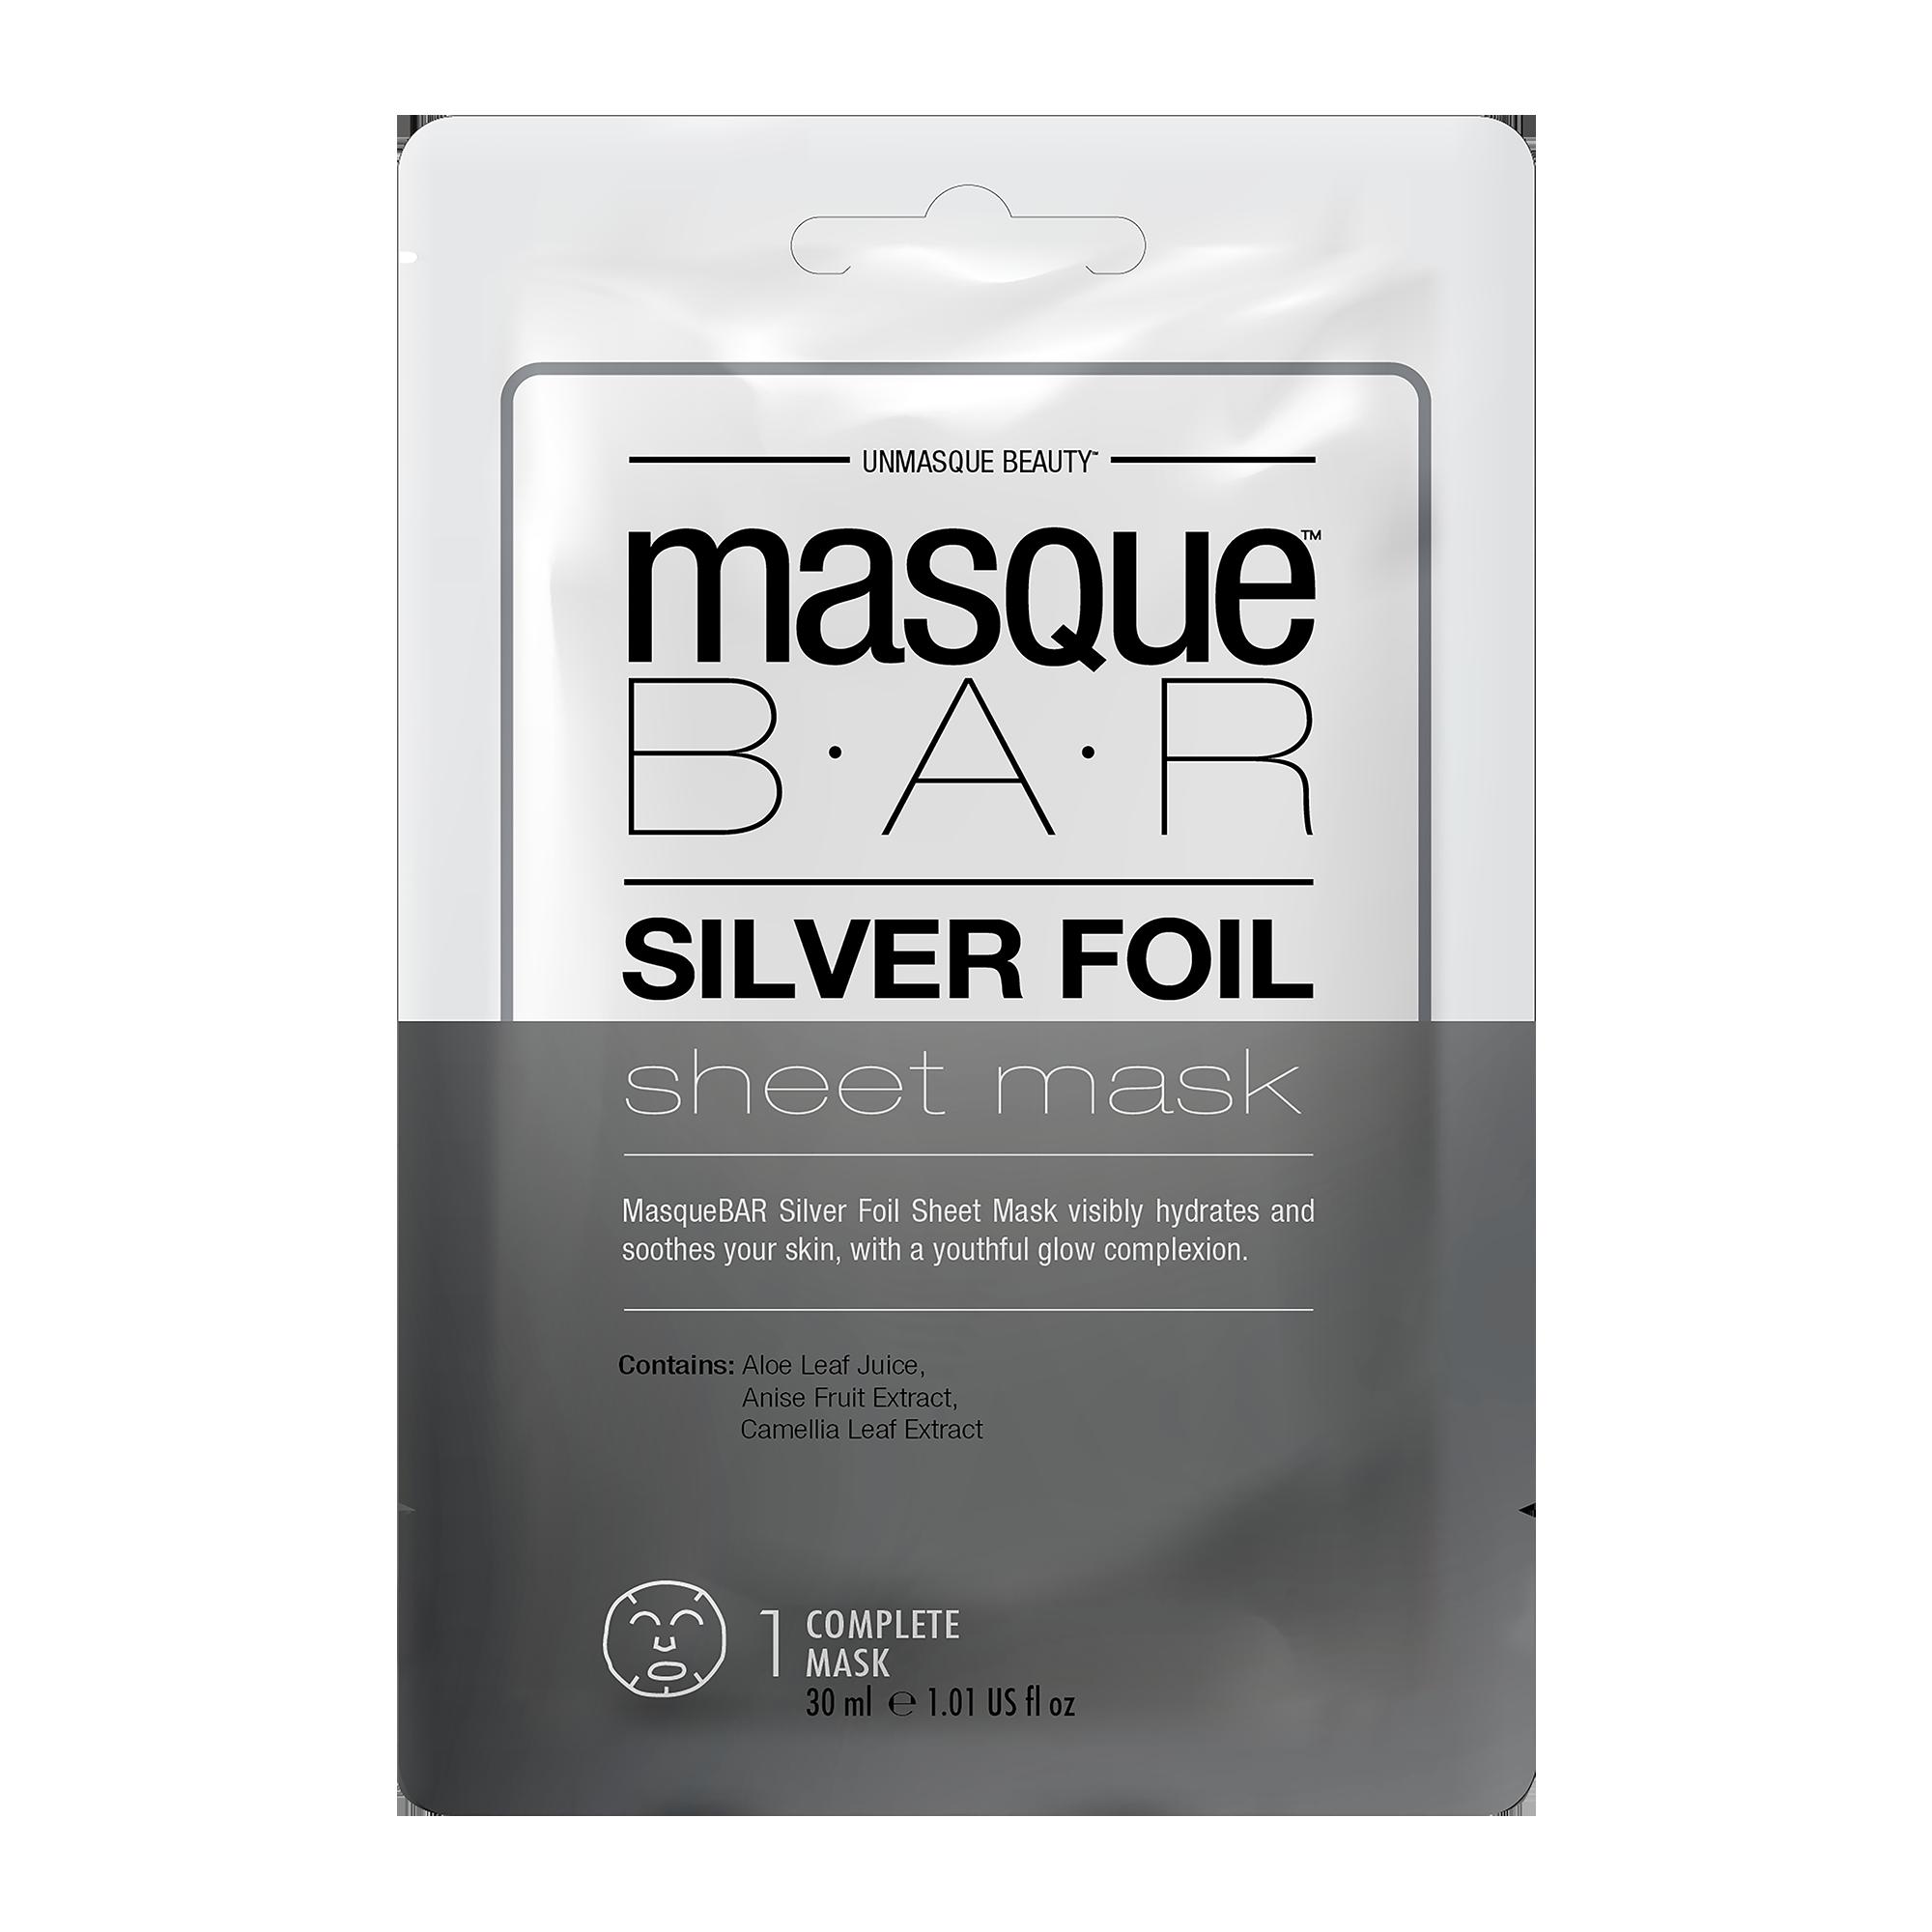 Foil Silver Sheet Mask